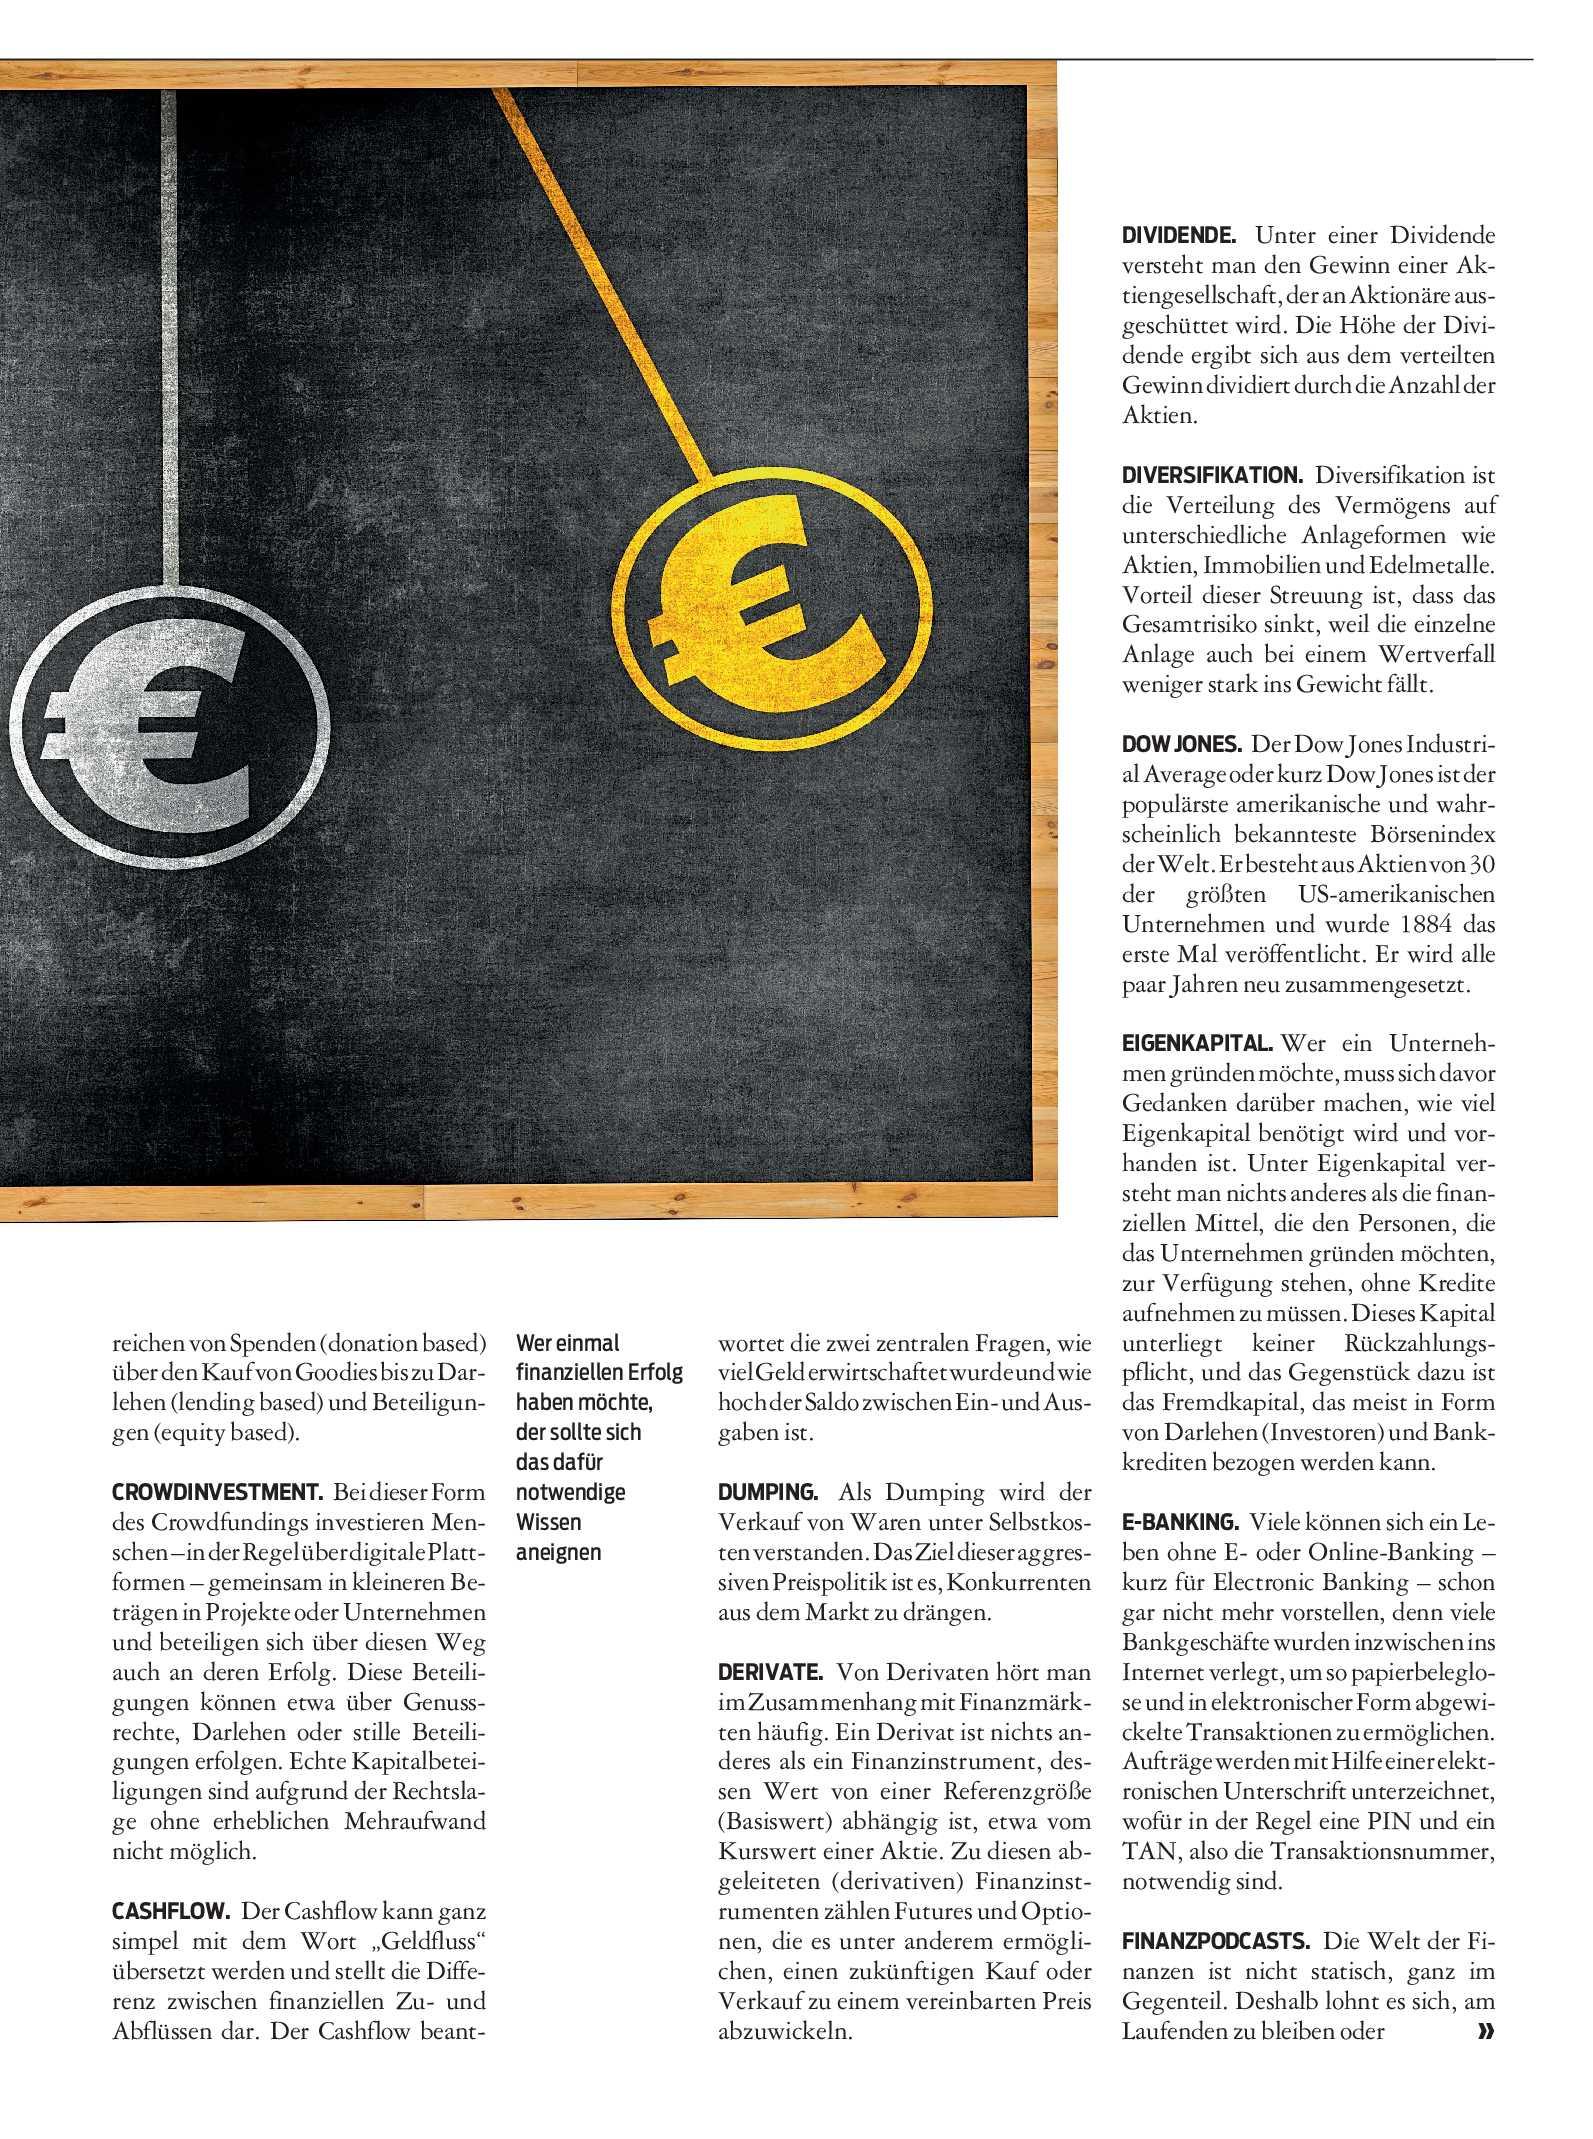 public/epaper/imported/20201118/kurier/magazin/magazin_20201118_143.jpg